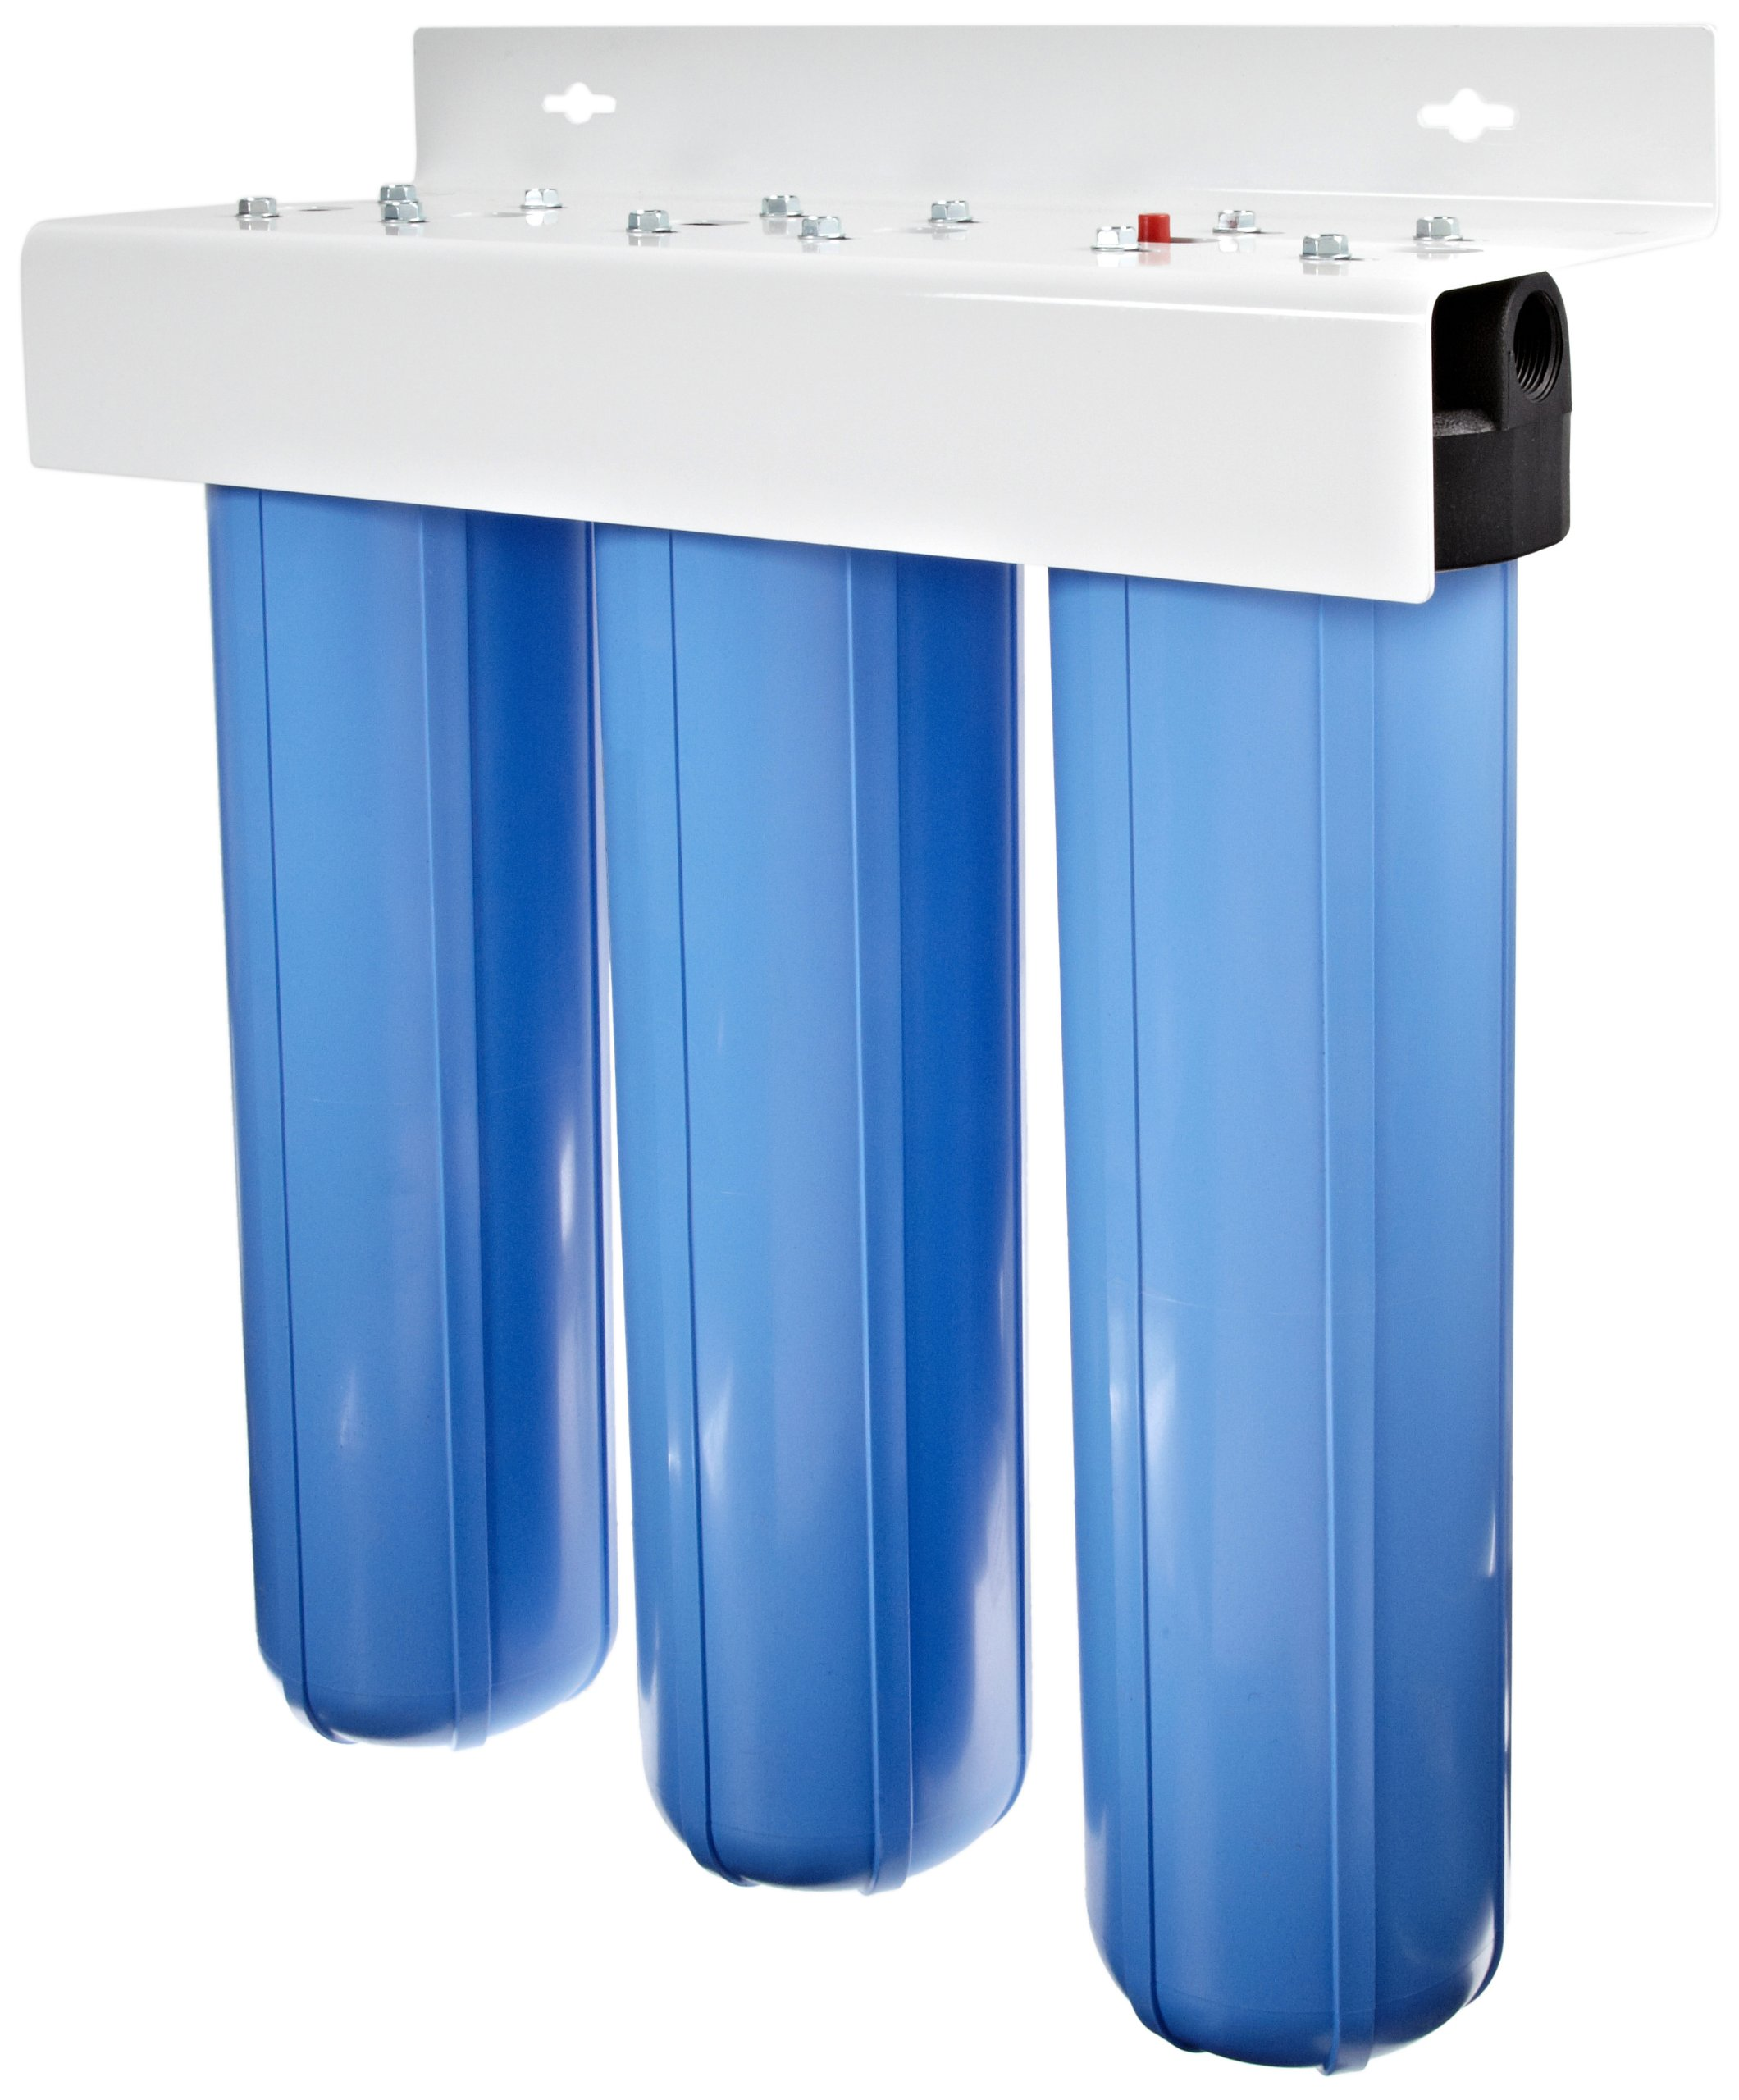 Pentek 160168 BBFS-222 1'' #20 Big Blue Three-Housing Filter System